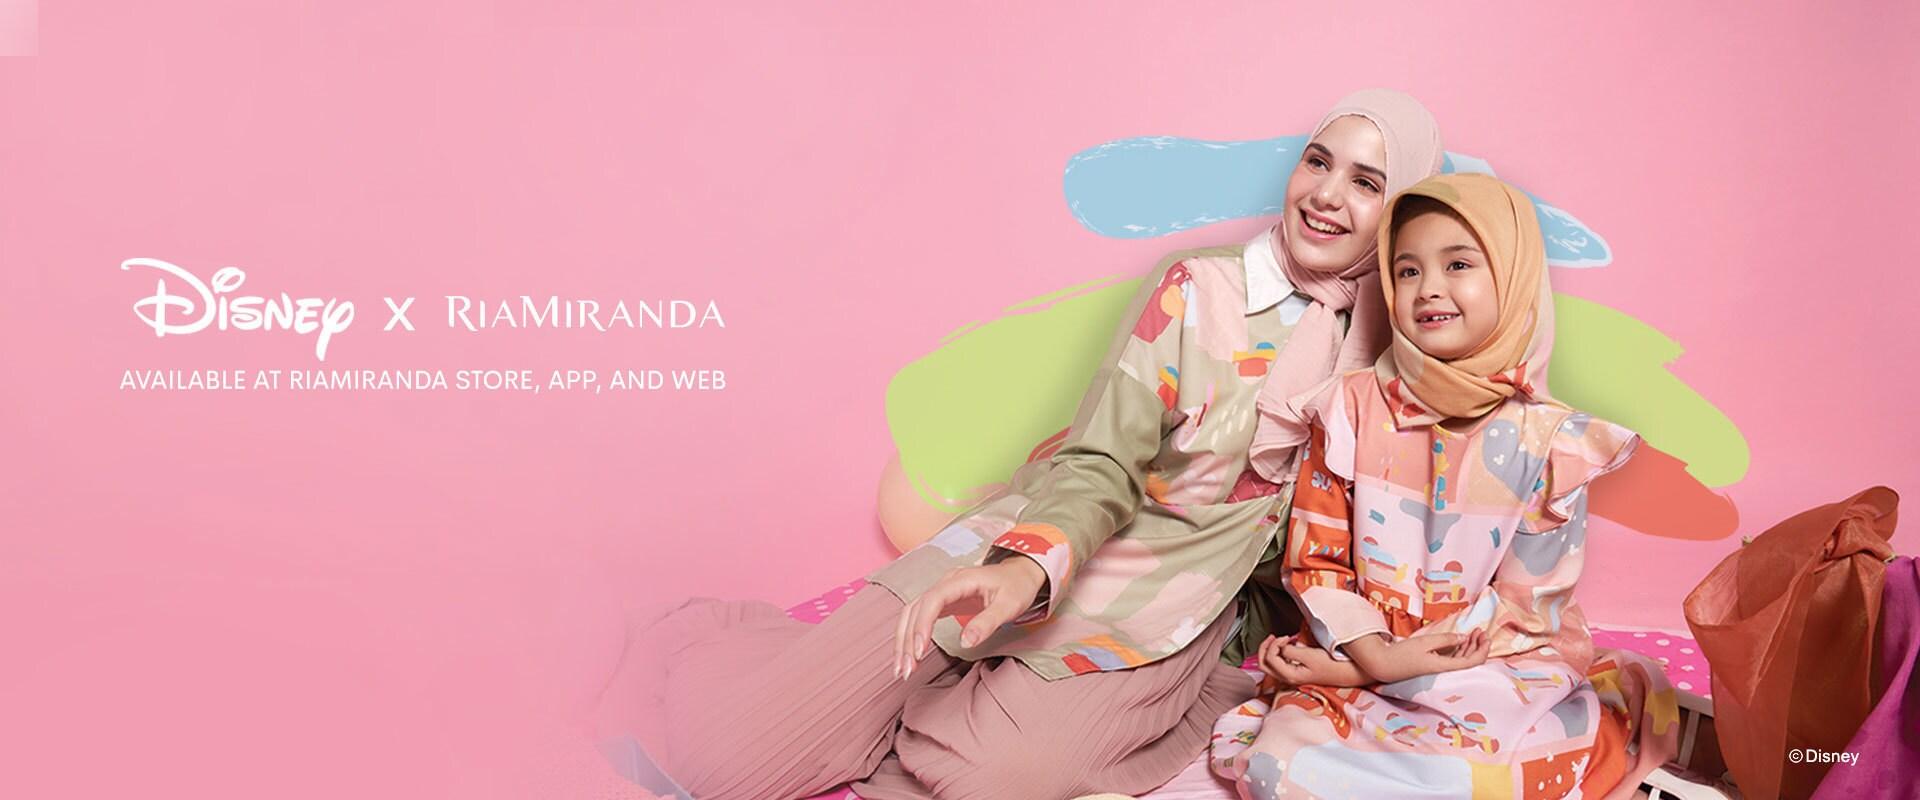 Shop Page Hero Banner - Ria Miranda Promotion